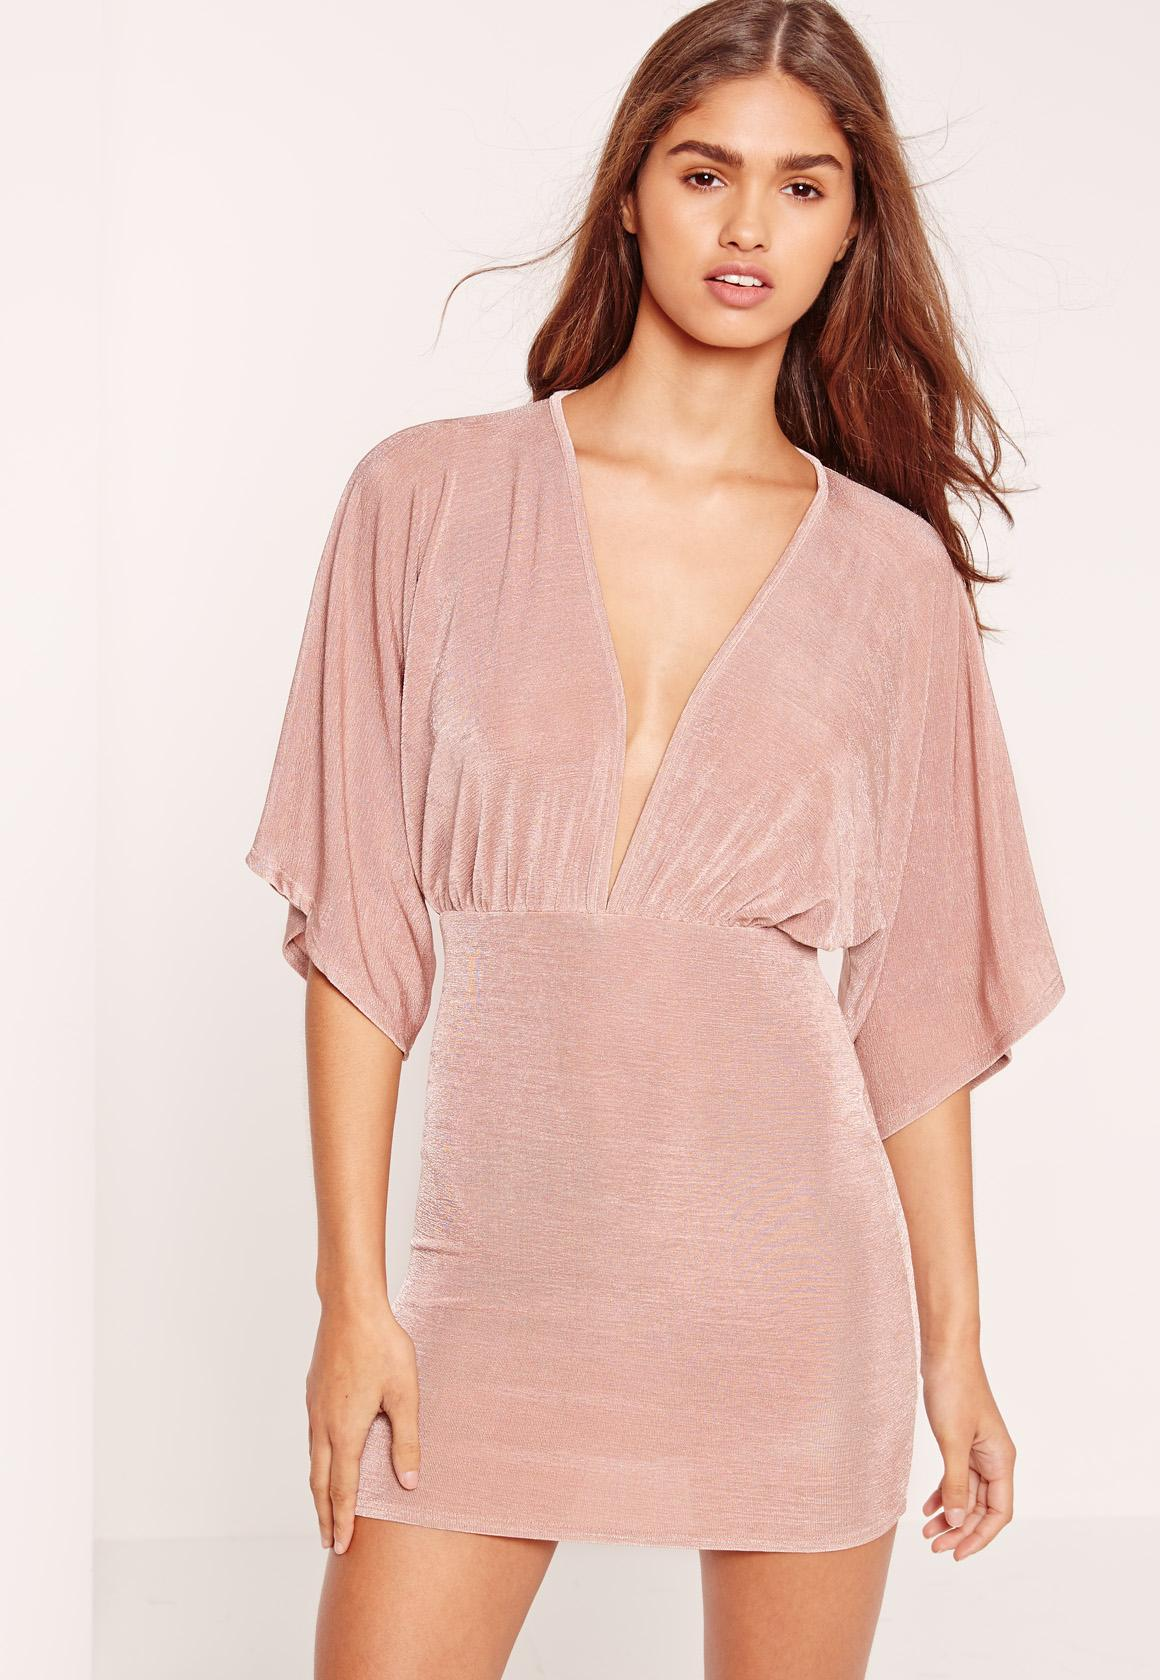 Petite Slinky Mini Dress Pink  59d9c9c9c7f